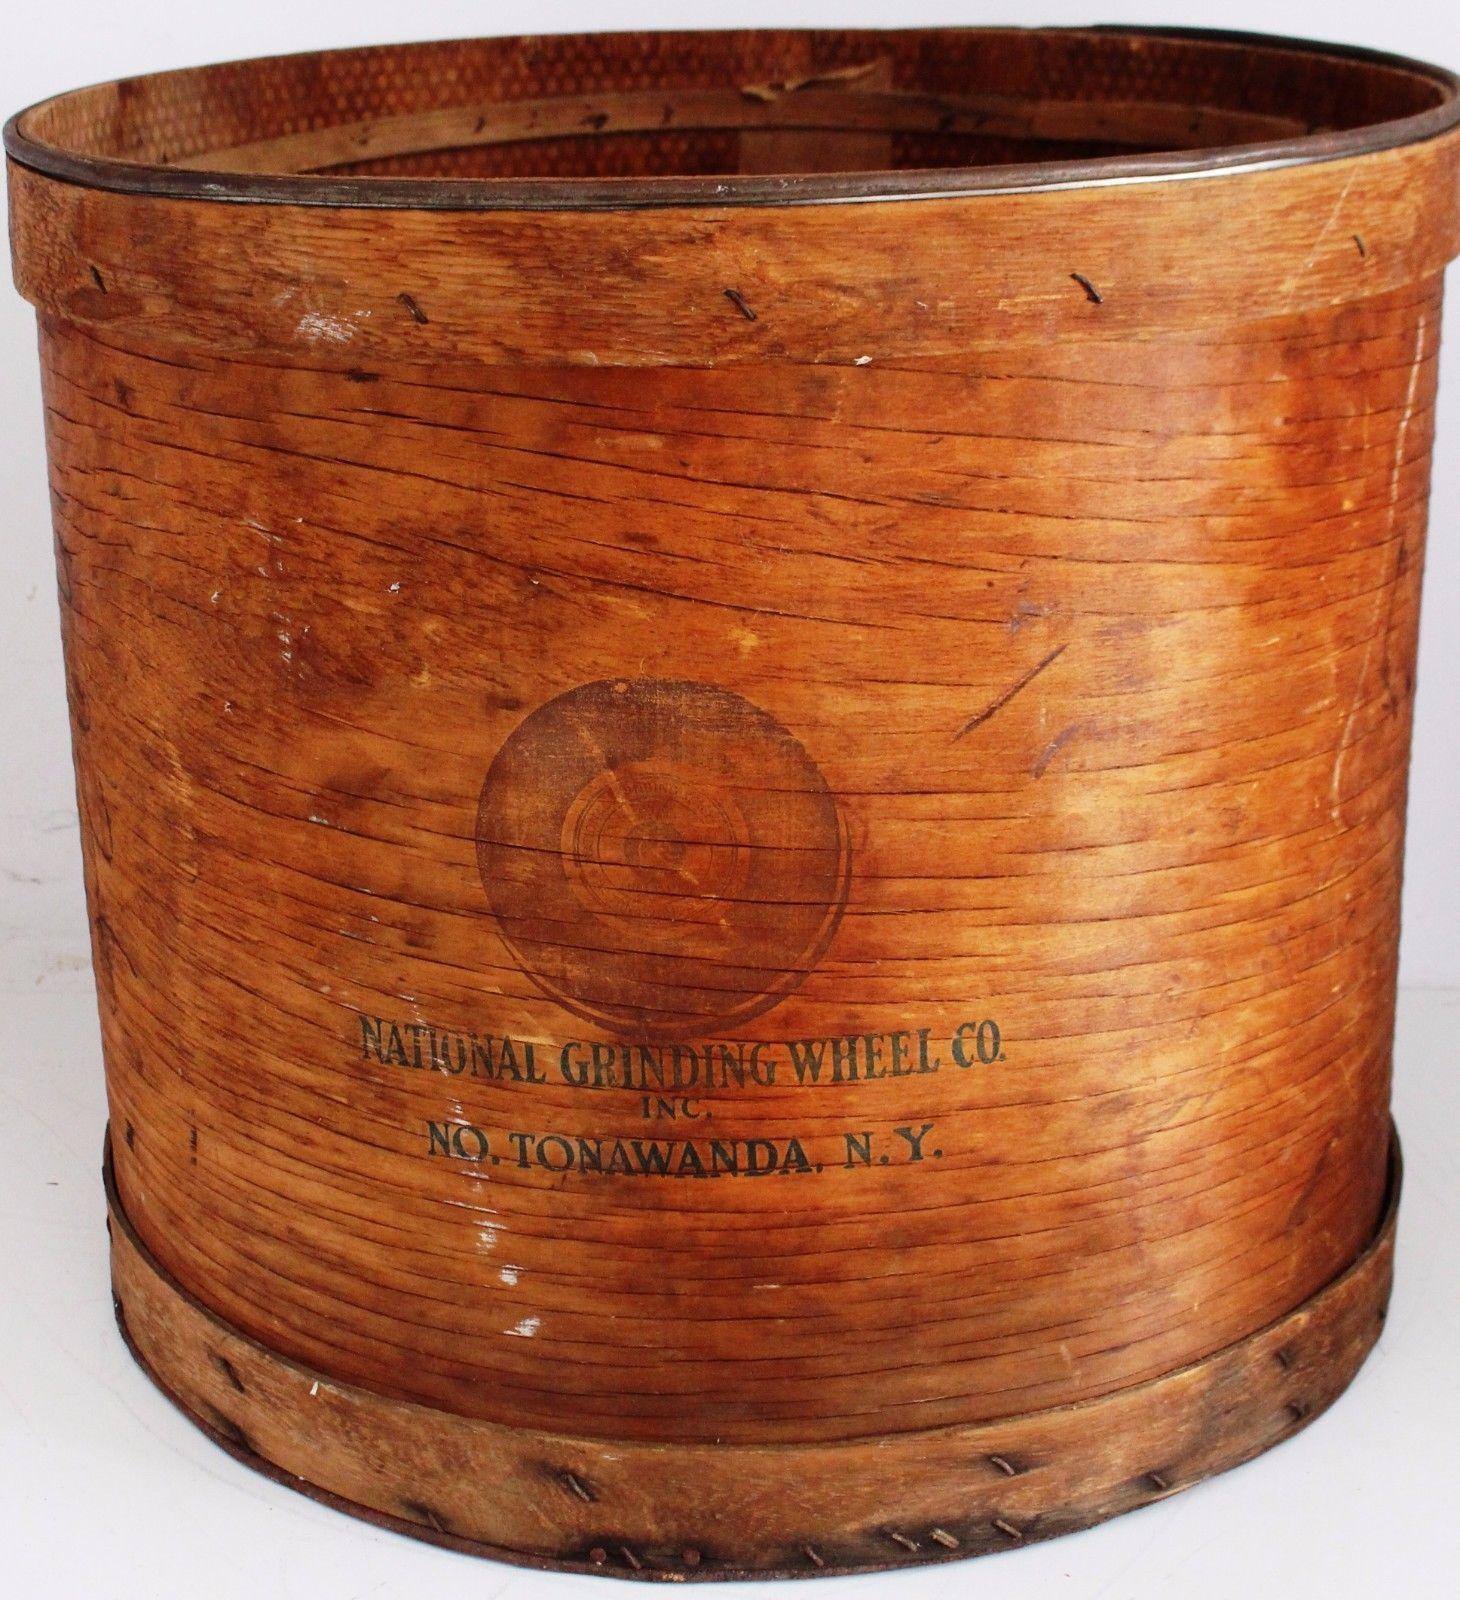 National Grinding Wheel, wood barrel (c1930).jpg